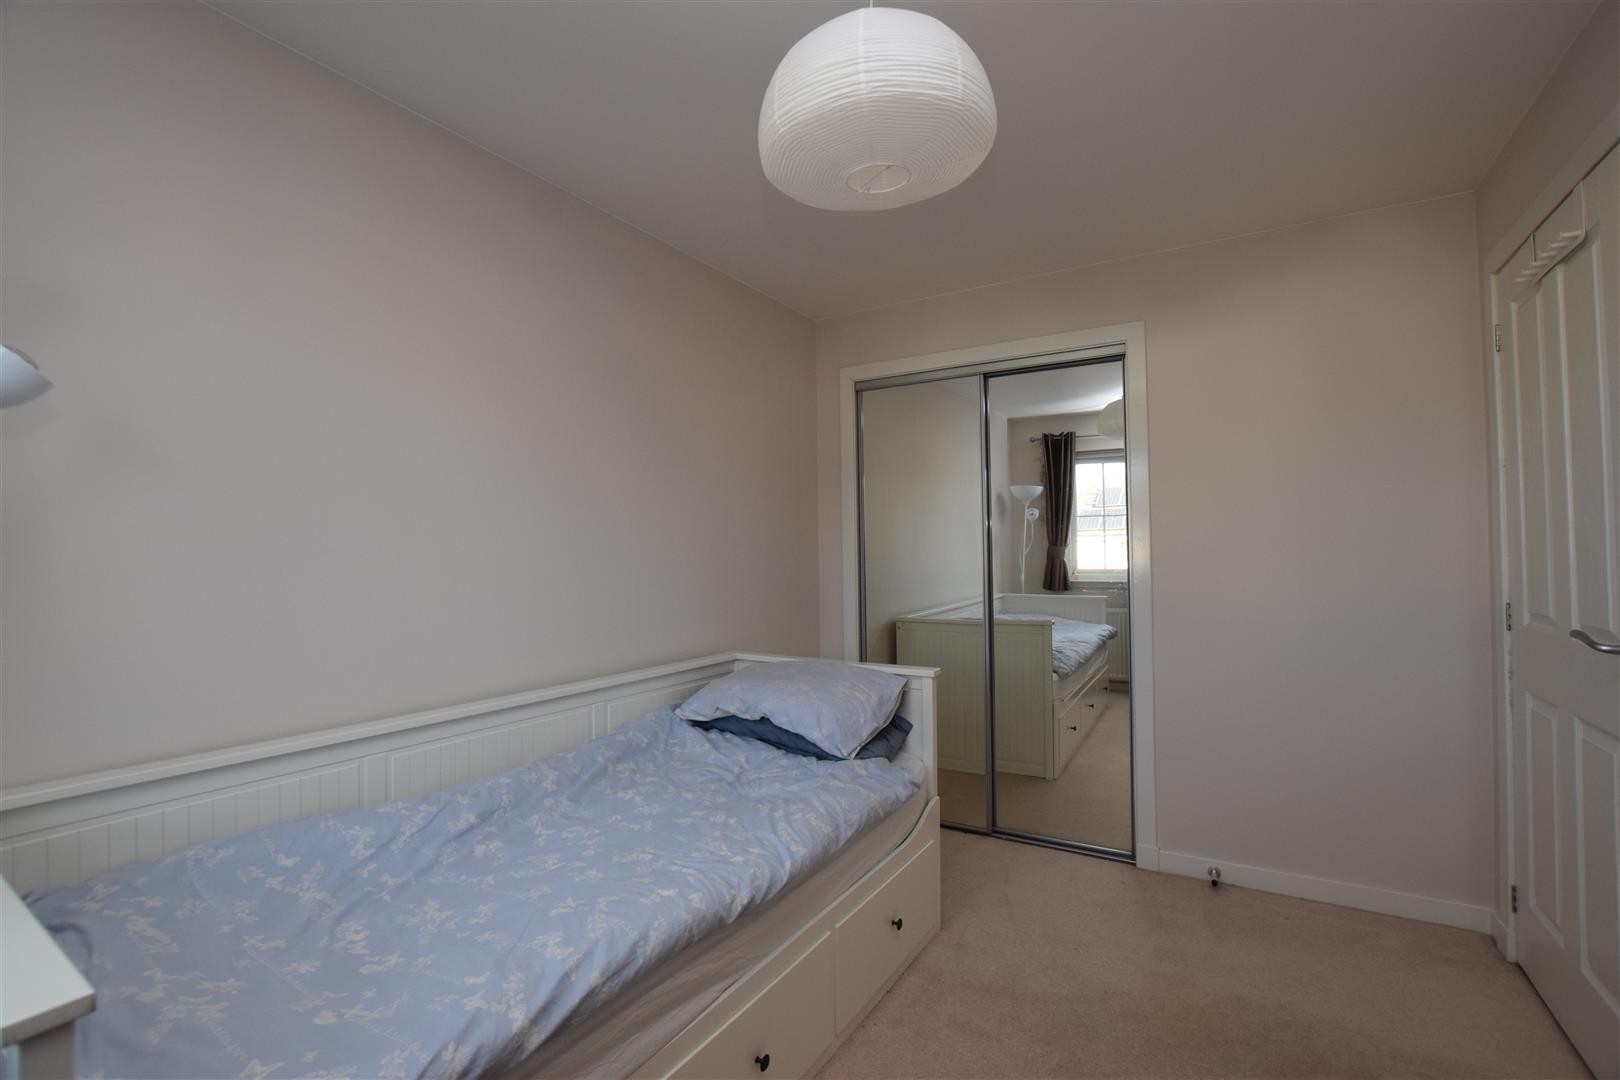 23, Glenturret Place, PERTH, Perthshire, PH1 3FP, UK